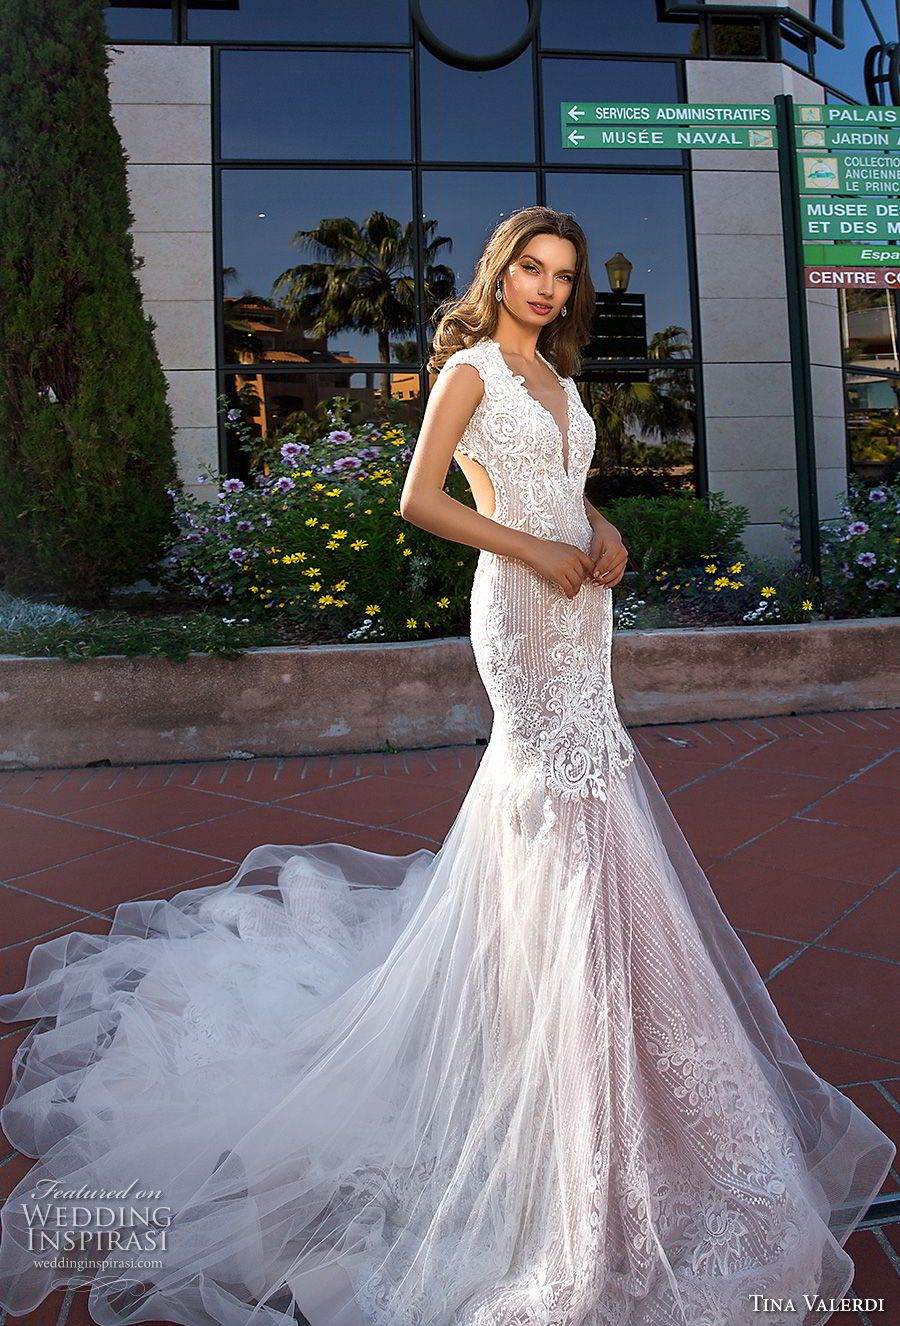 Lace off shoulder wedding dress august 2019 Tina Valerdi  Wedding Dresses u ucIum Yoursud Bridal Collection